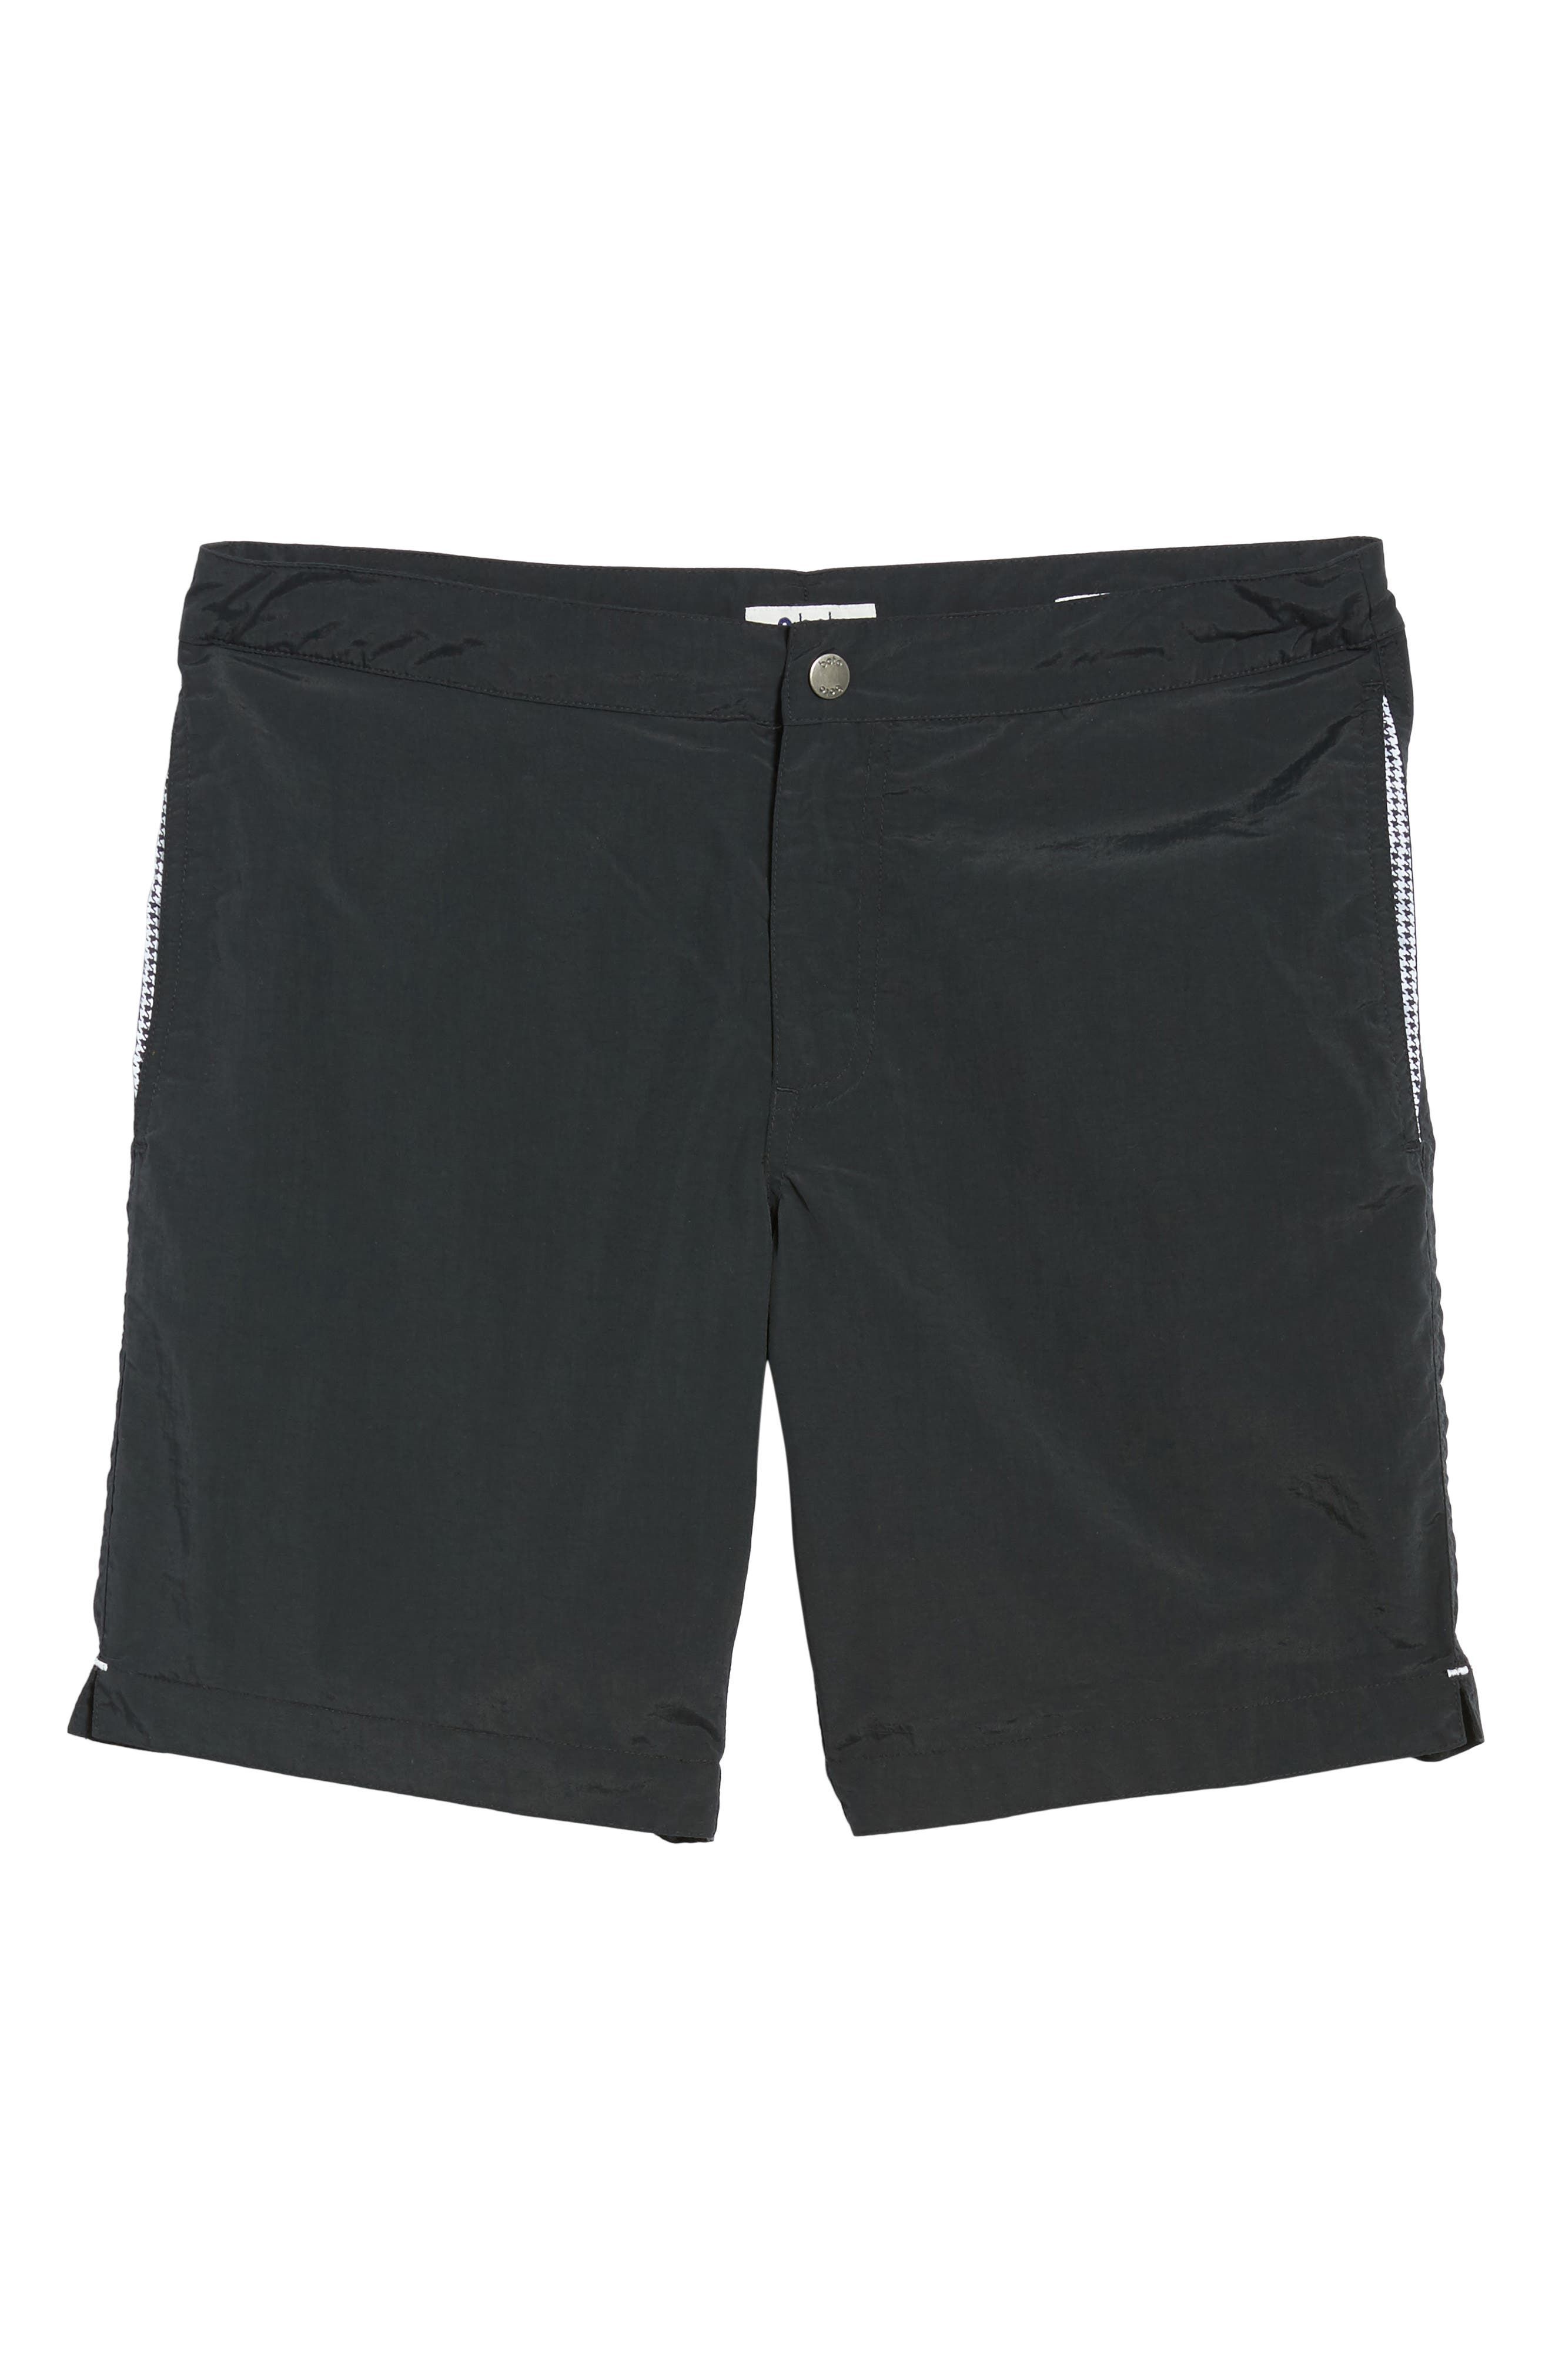 'Aruba - Island' Tailored Fit 8.5 Inch Board Shorts,                             Alternate thumbnail 20, color,